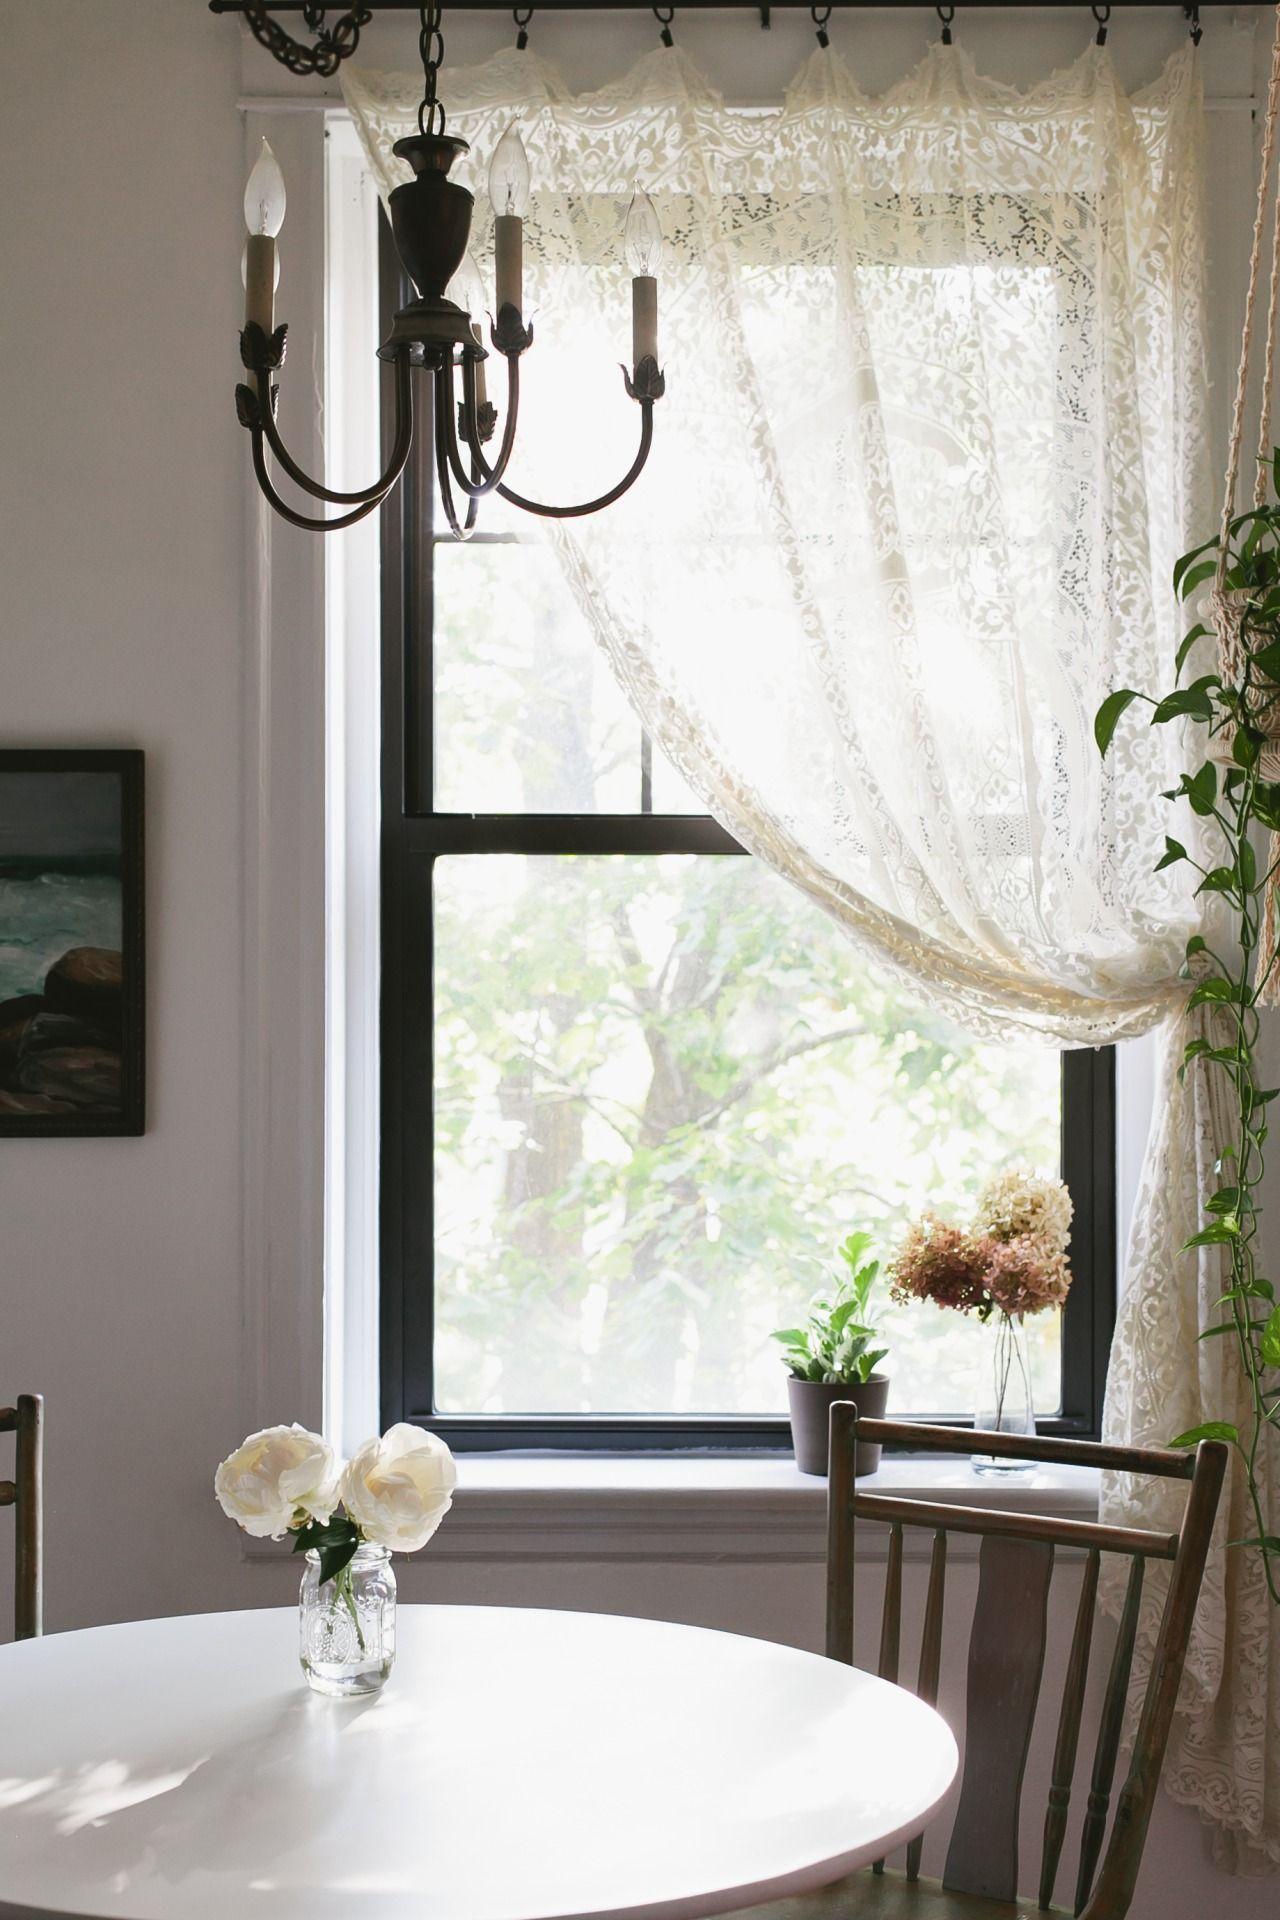 Image result for vintage kitchen curtains white blue trim